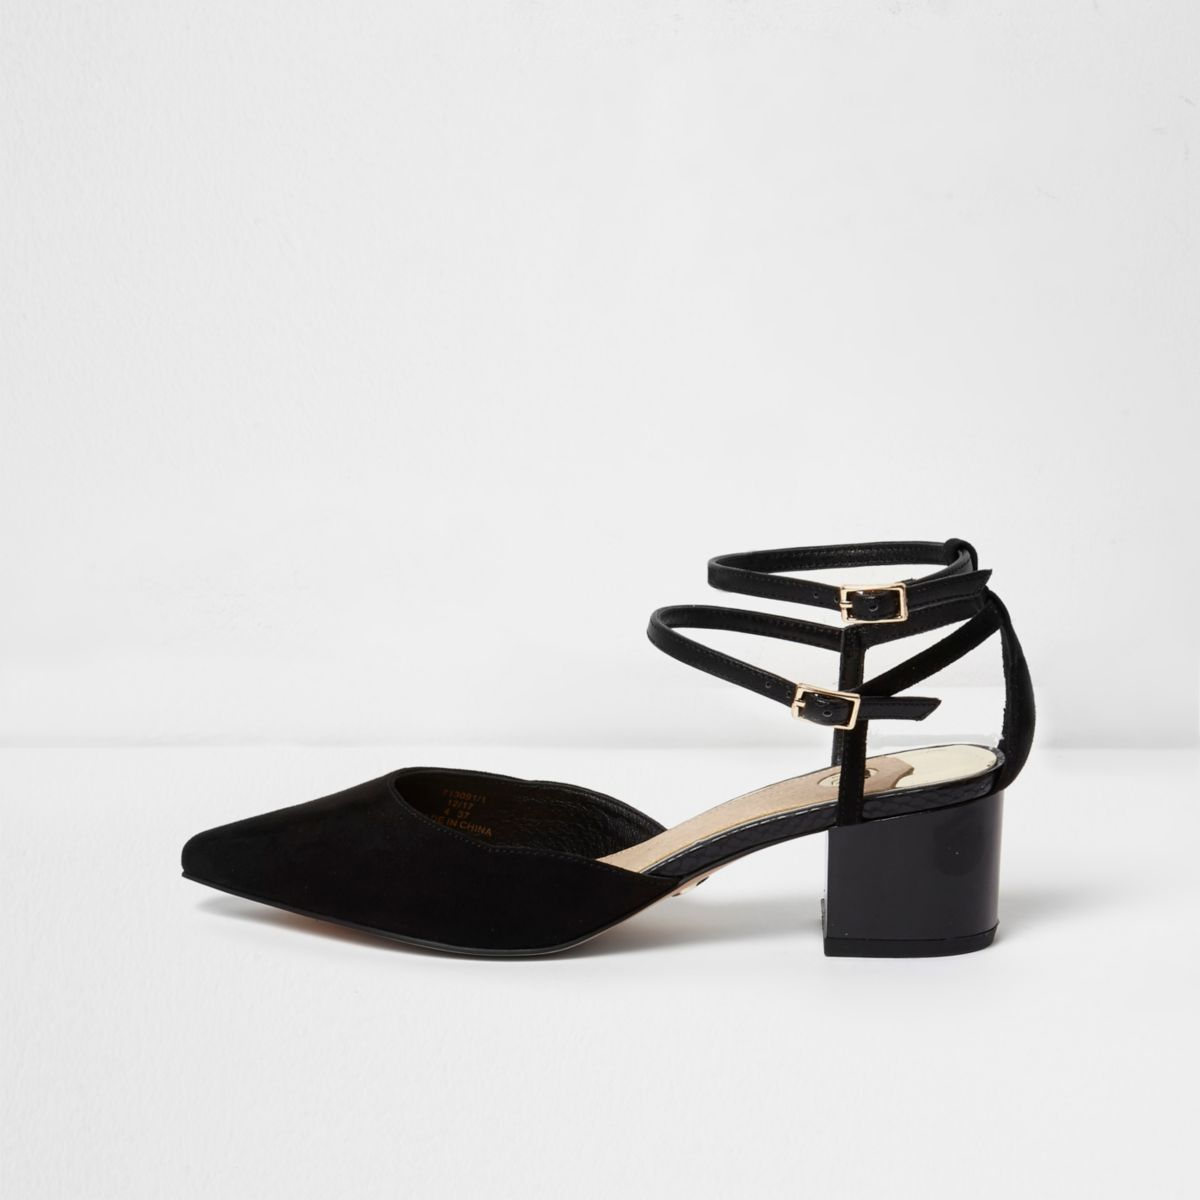 Black pointed toe block heel shoes